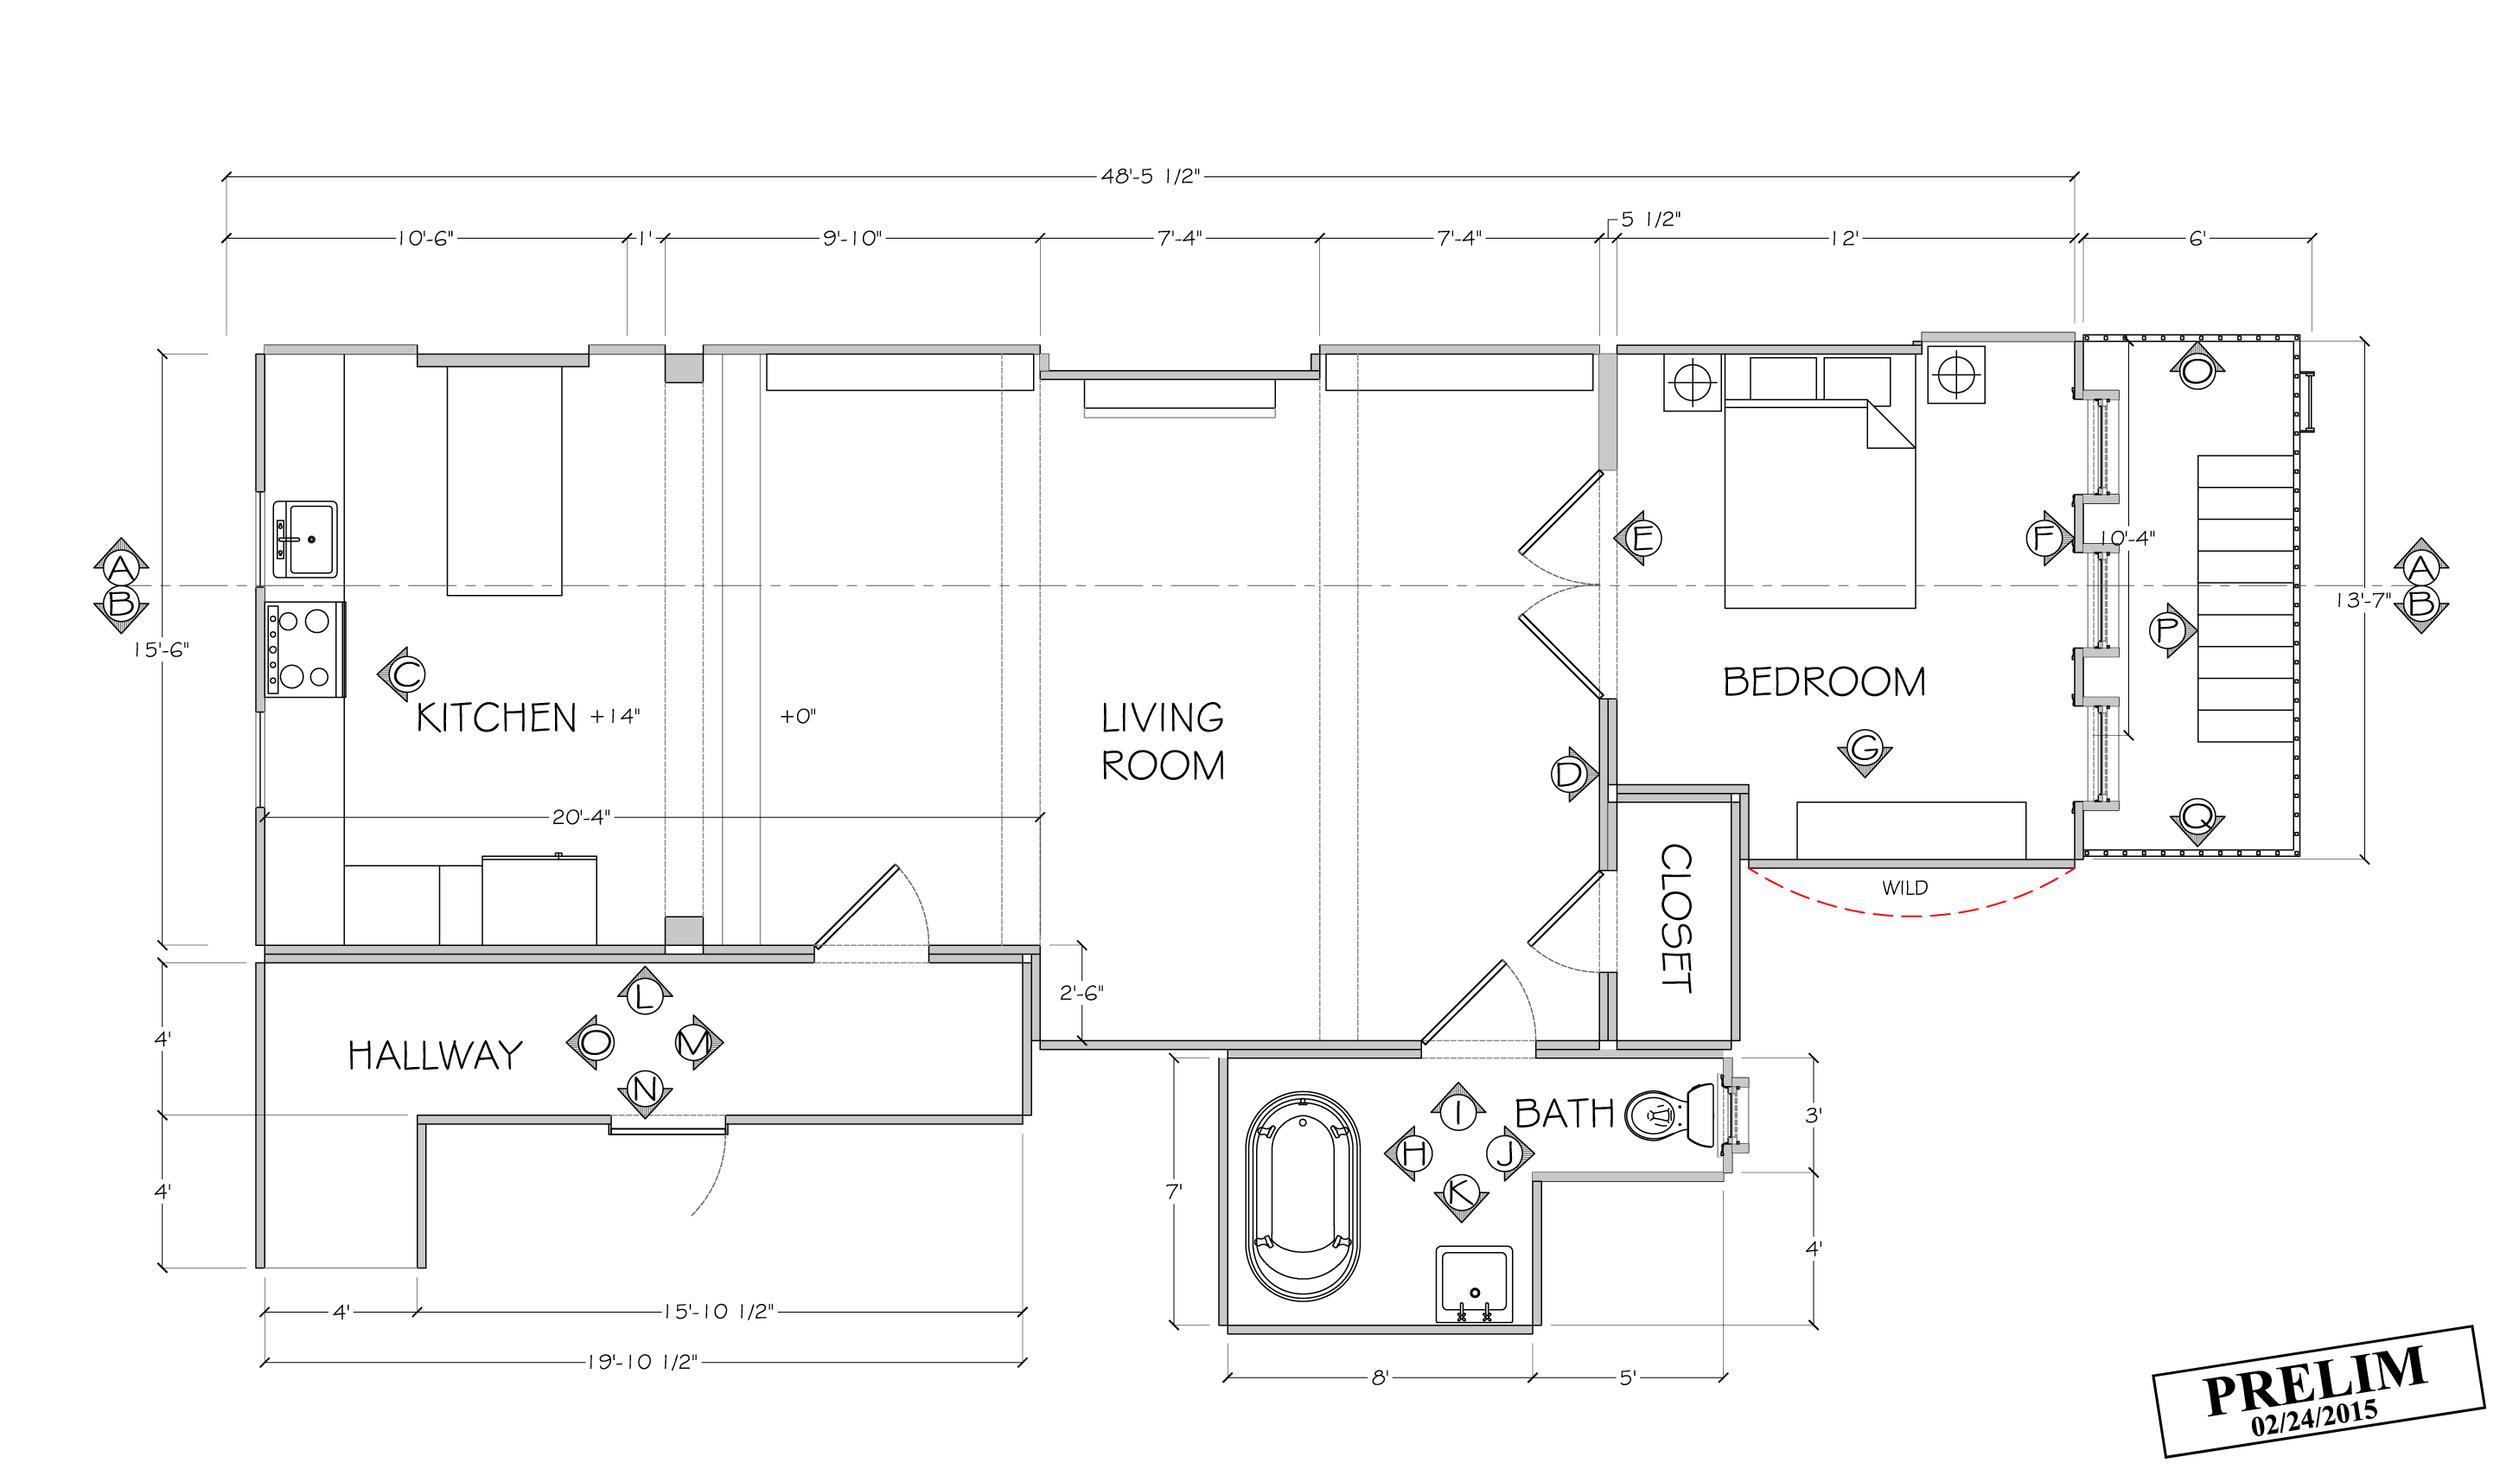 Dev's Apartment Floor Plan